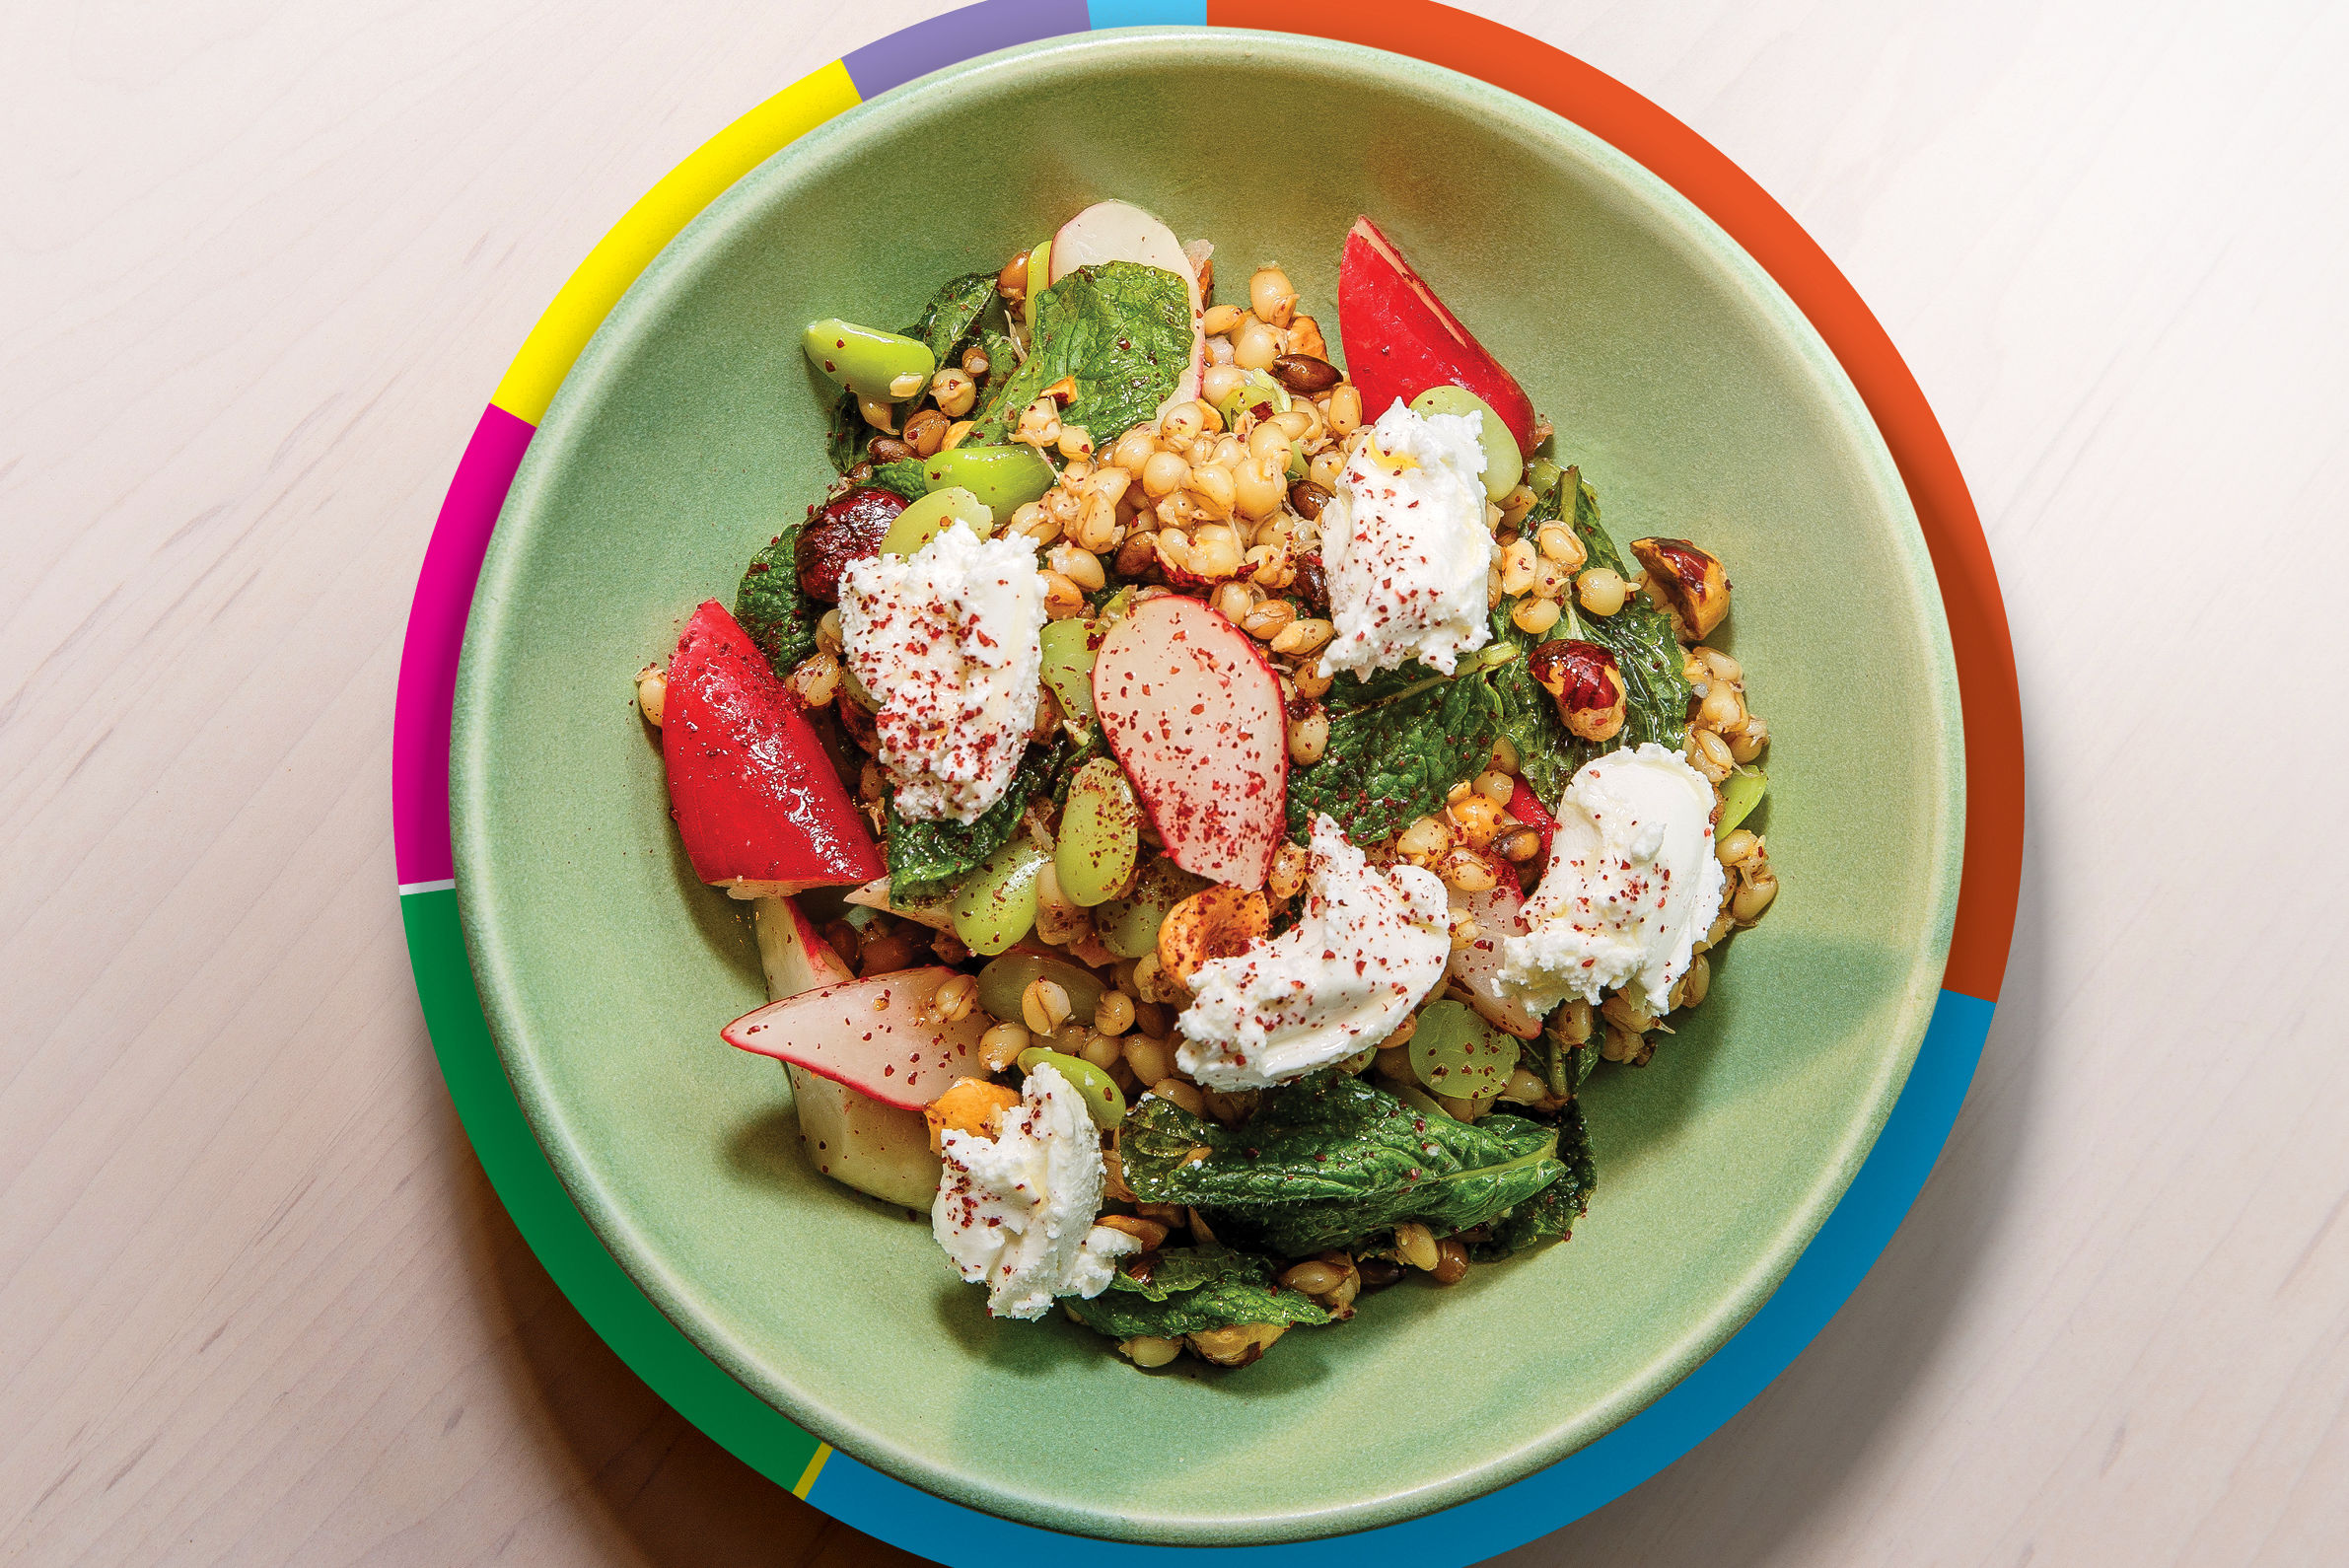 Pomo 0417 salad math kch38r